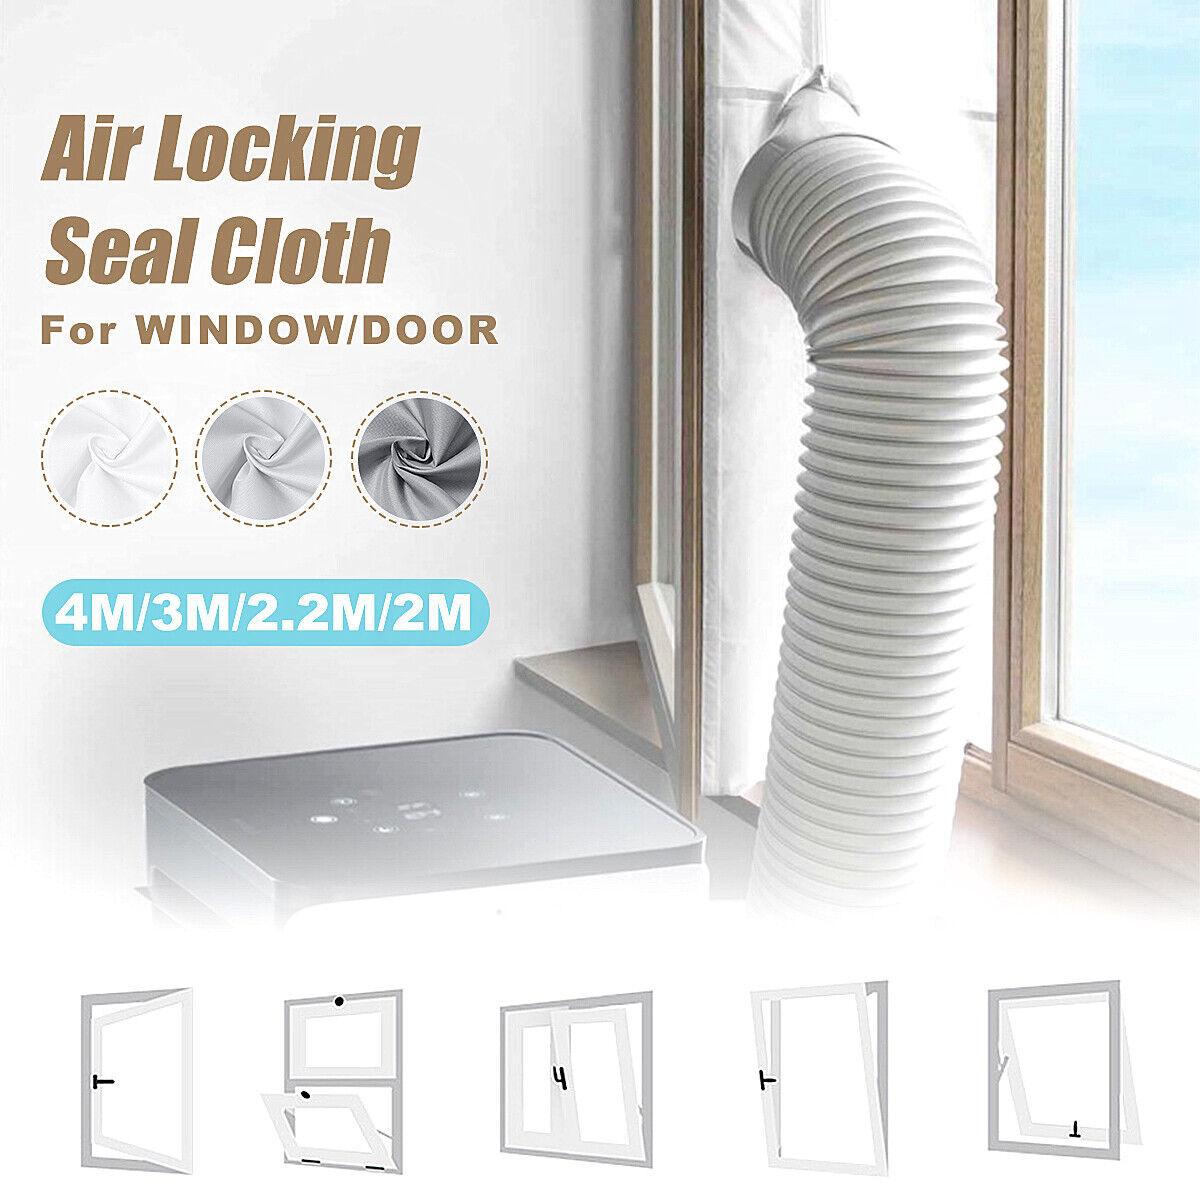 2-4M Window Sliding Door Seal Kit Cloth Air Locking For Port